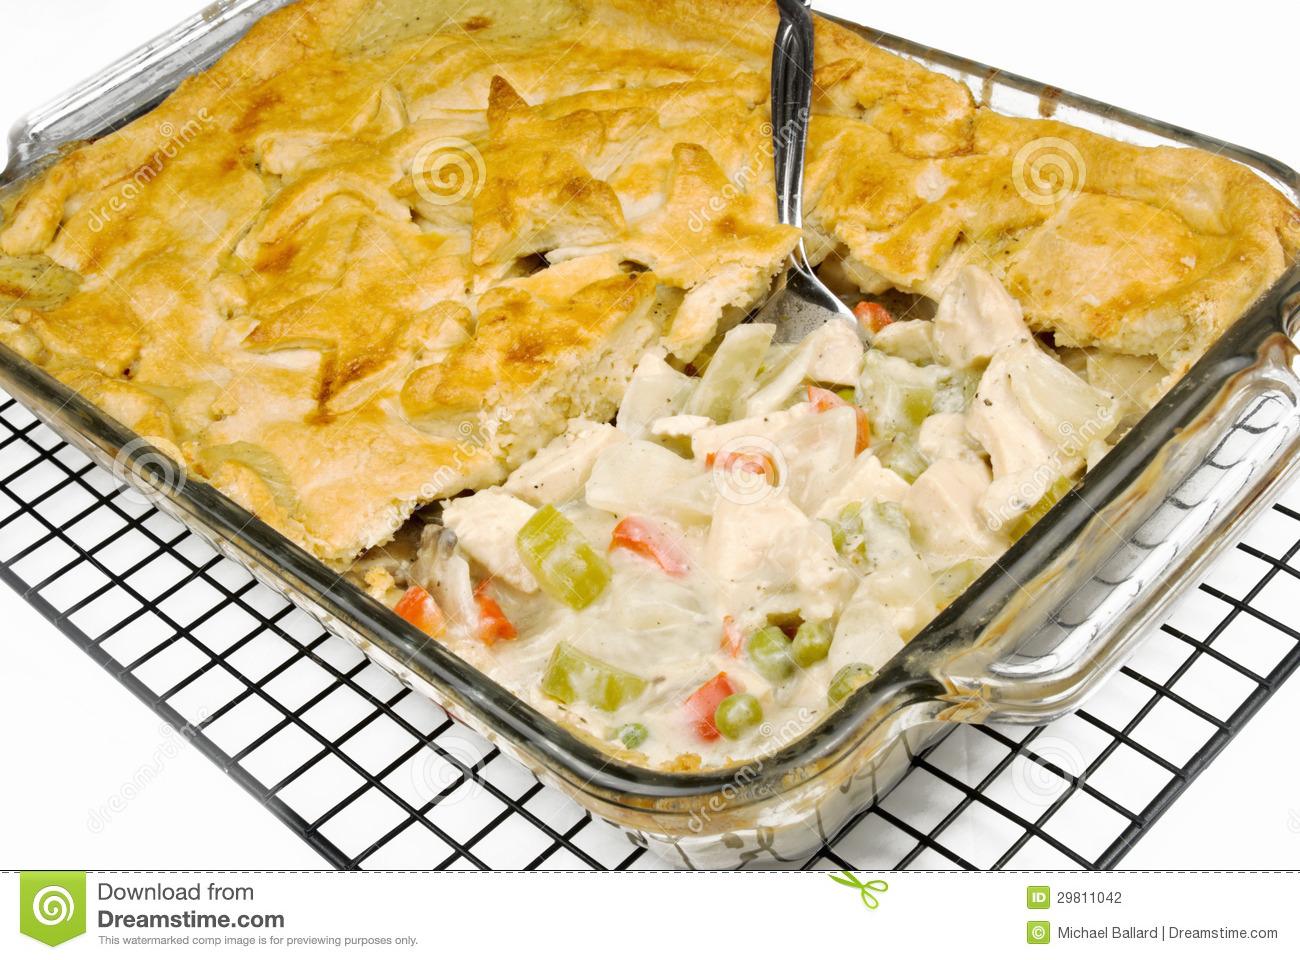 Chicken pot pie stock photo. Image of celery, food, mushrooms.